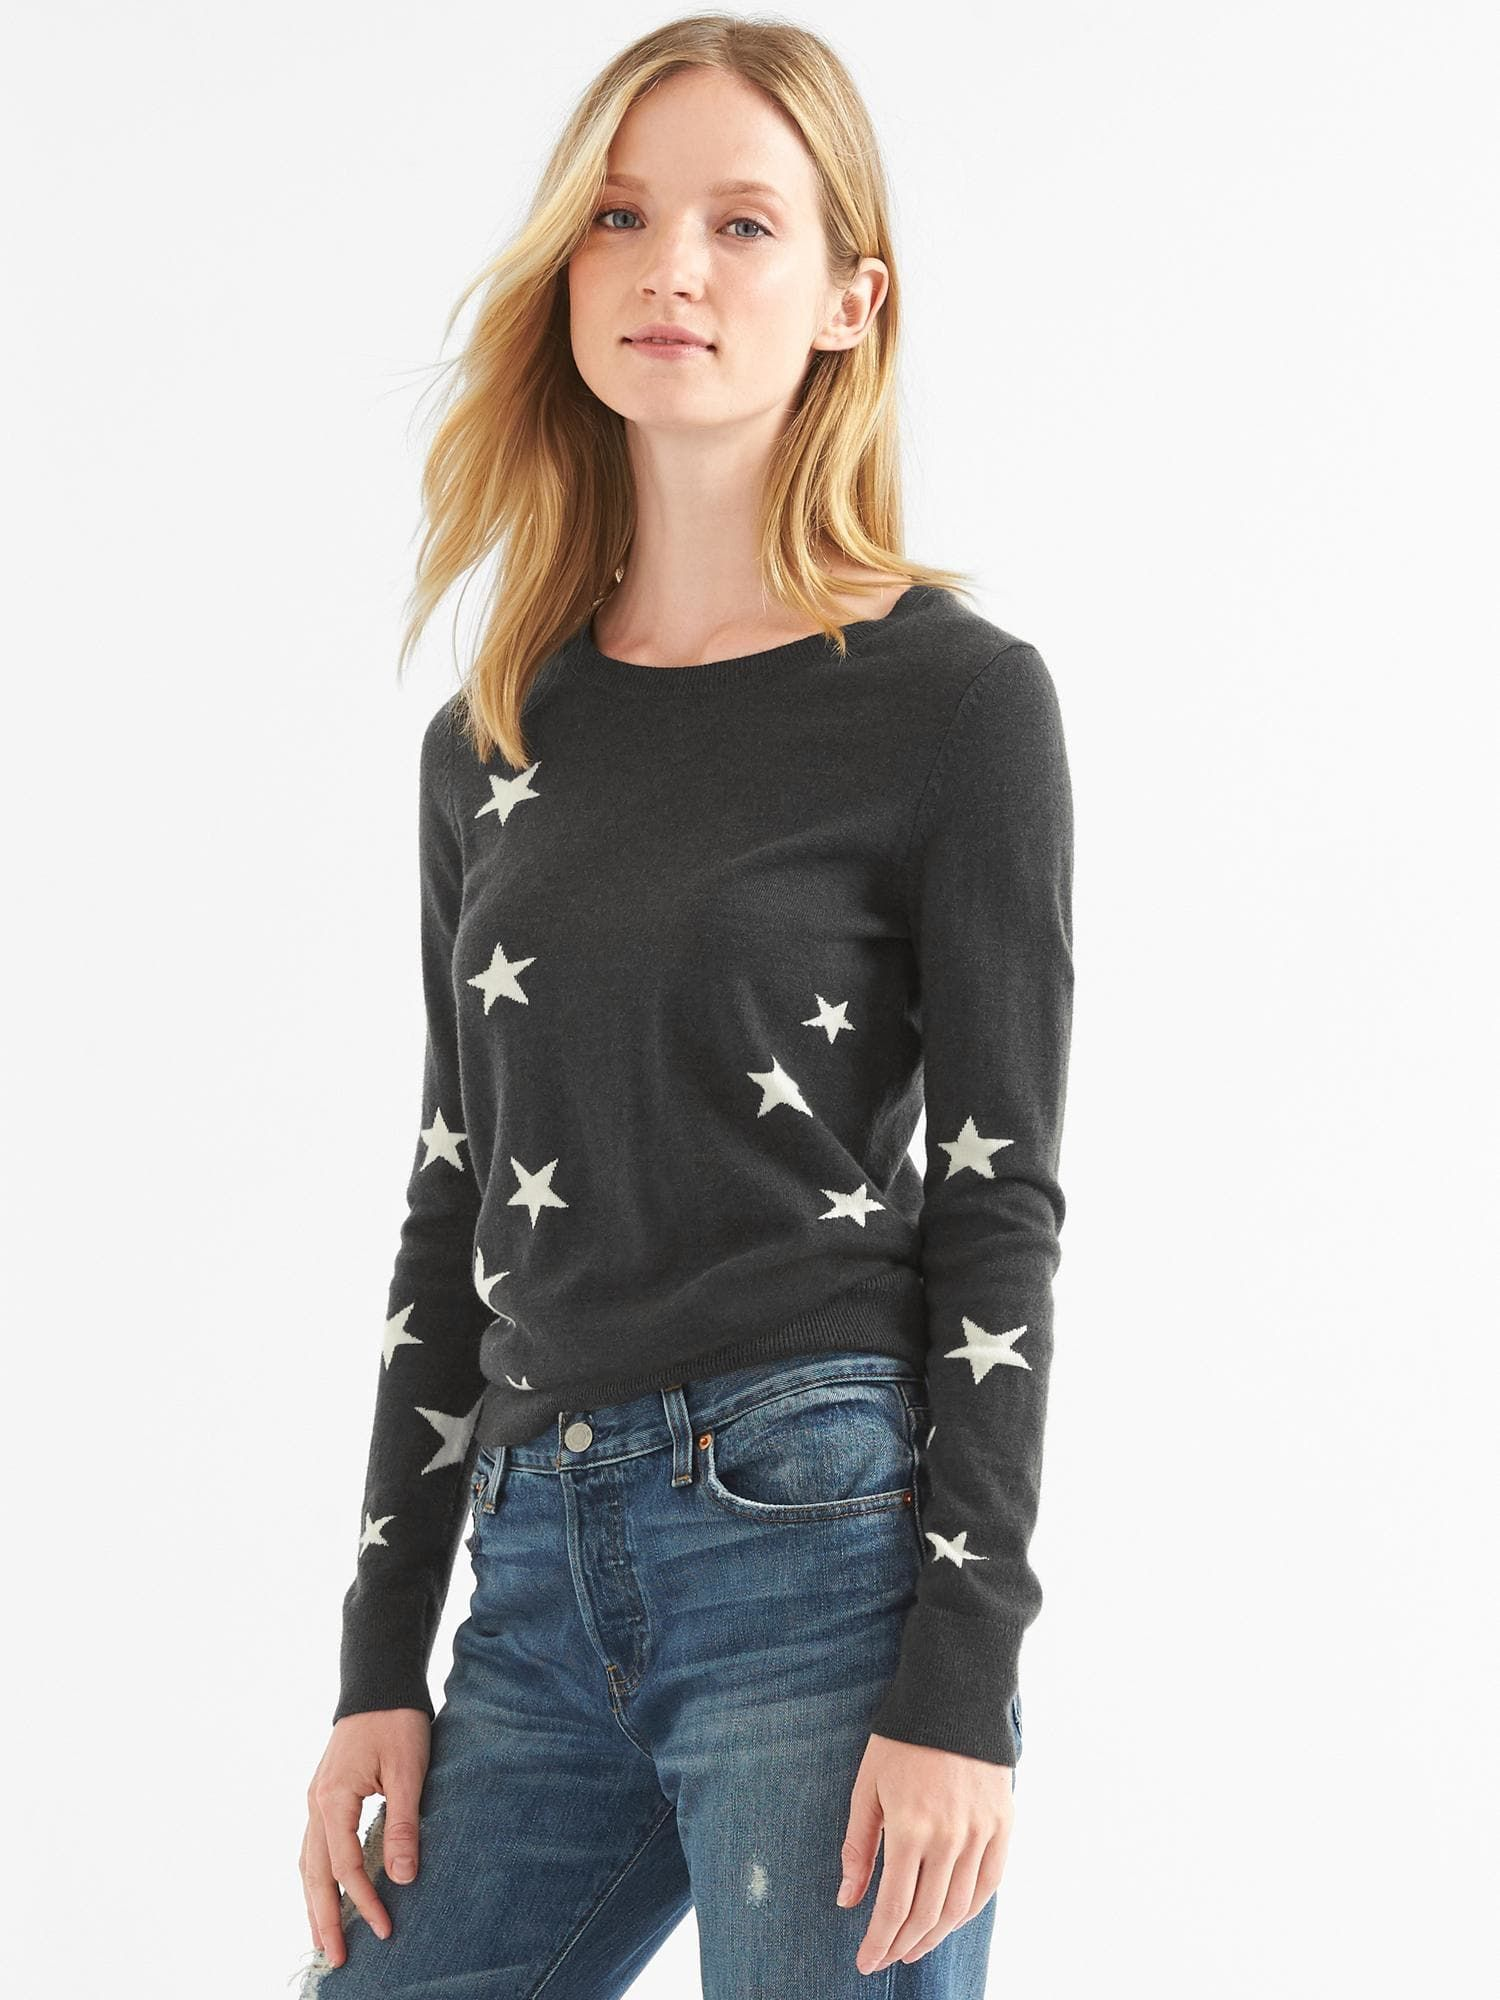 cce4a9ef9b9c8 Merino star crewneck sweater